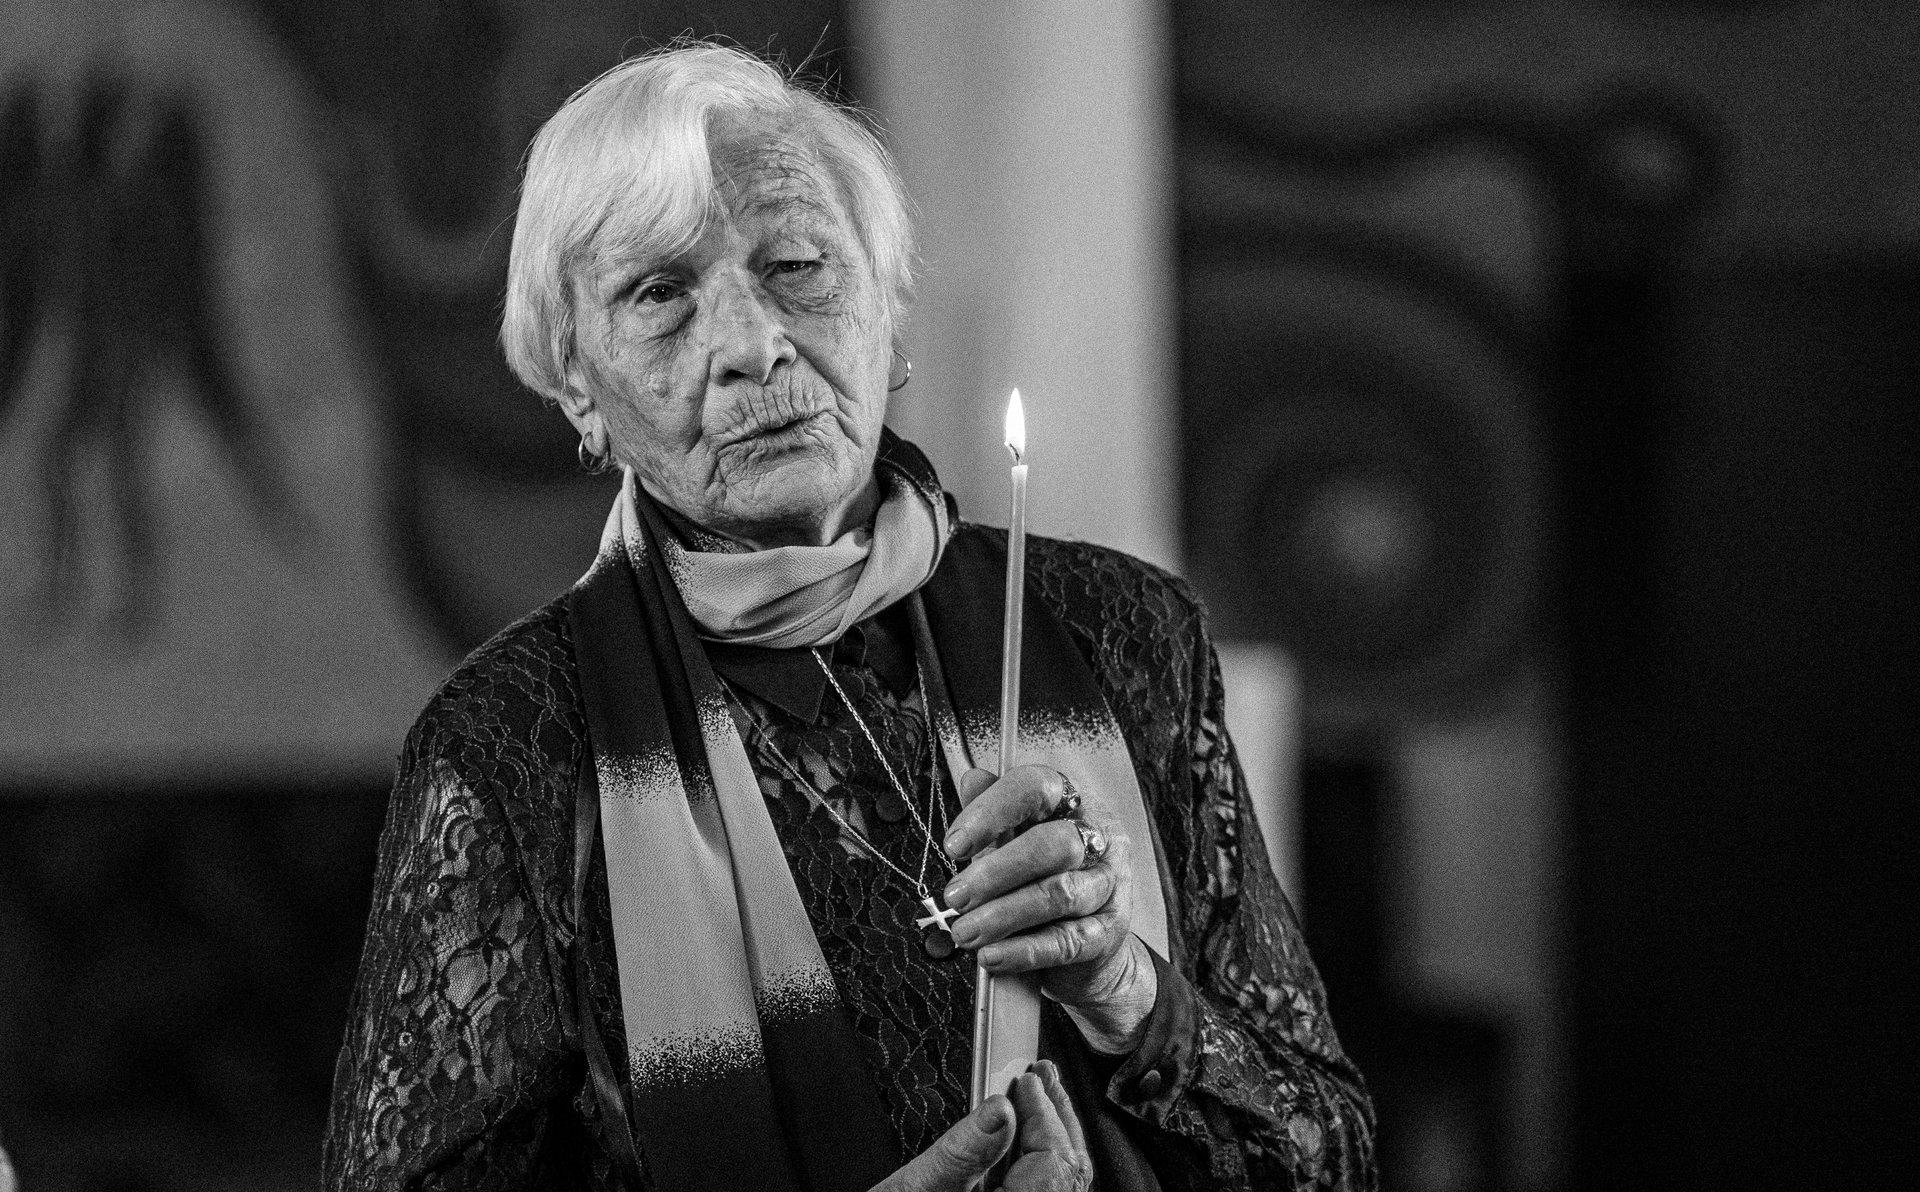 Photo in Daily round | Author Asen Najdenov - silvesar | PHOTO FORUM